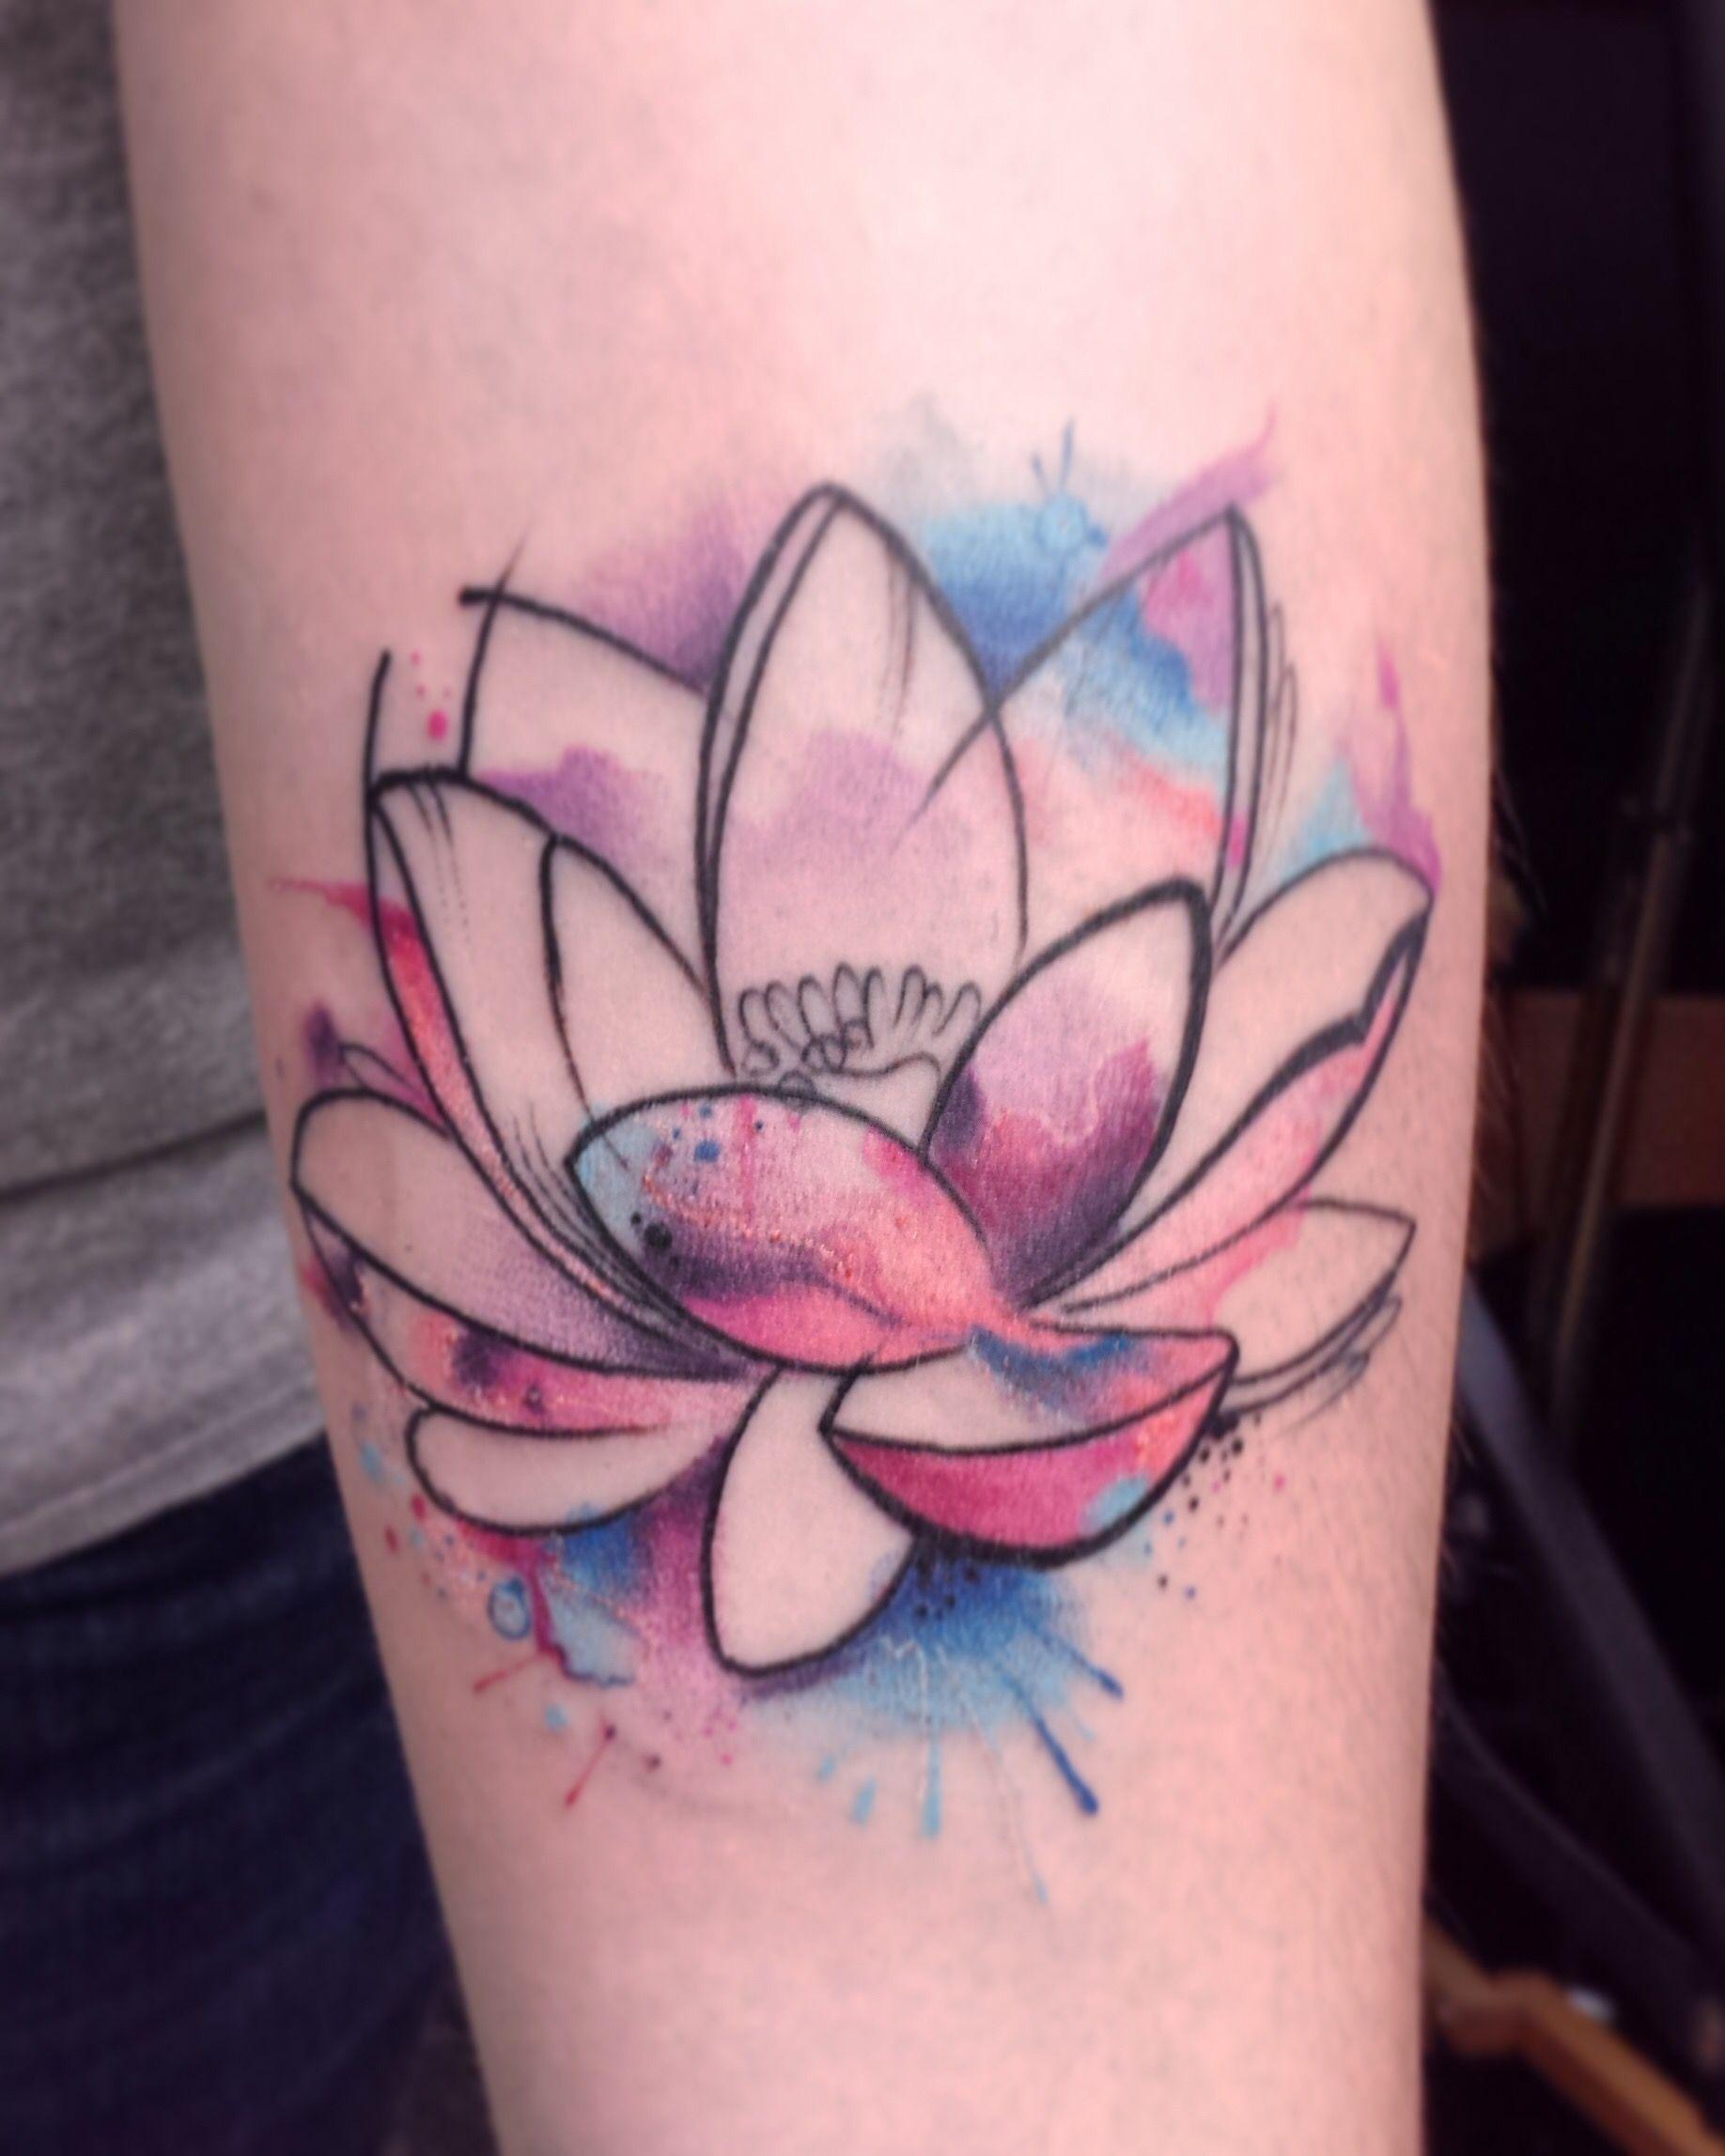 Pin By Ariana Long On Tattoo Ideas Pinterest Tattoo Piercing